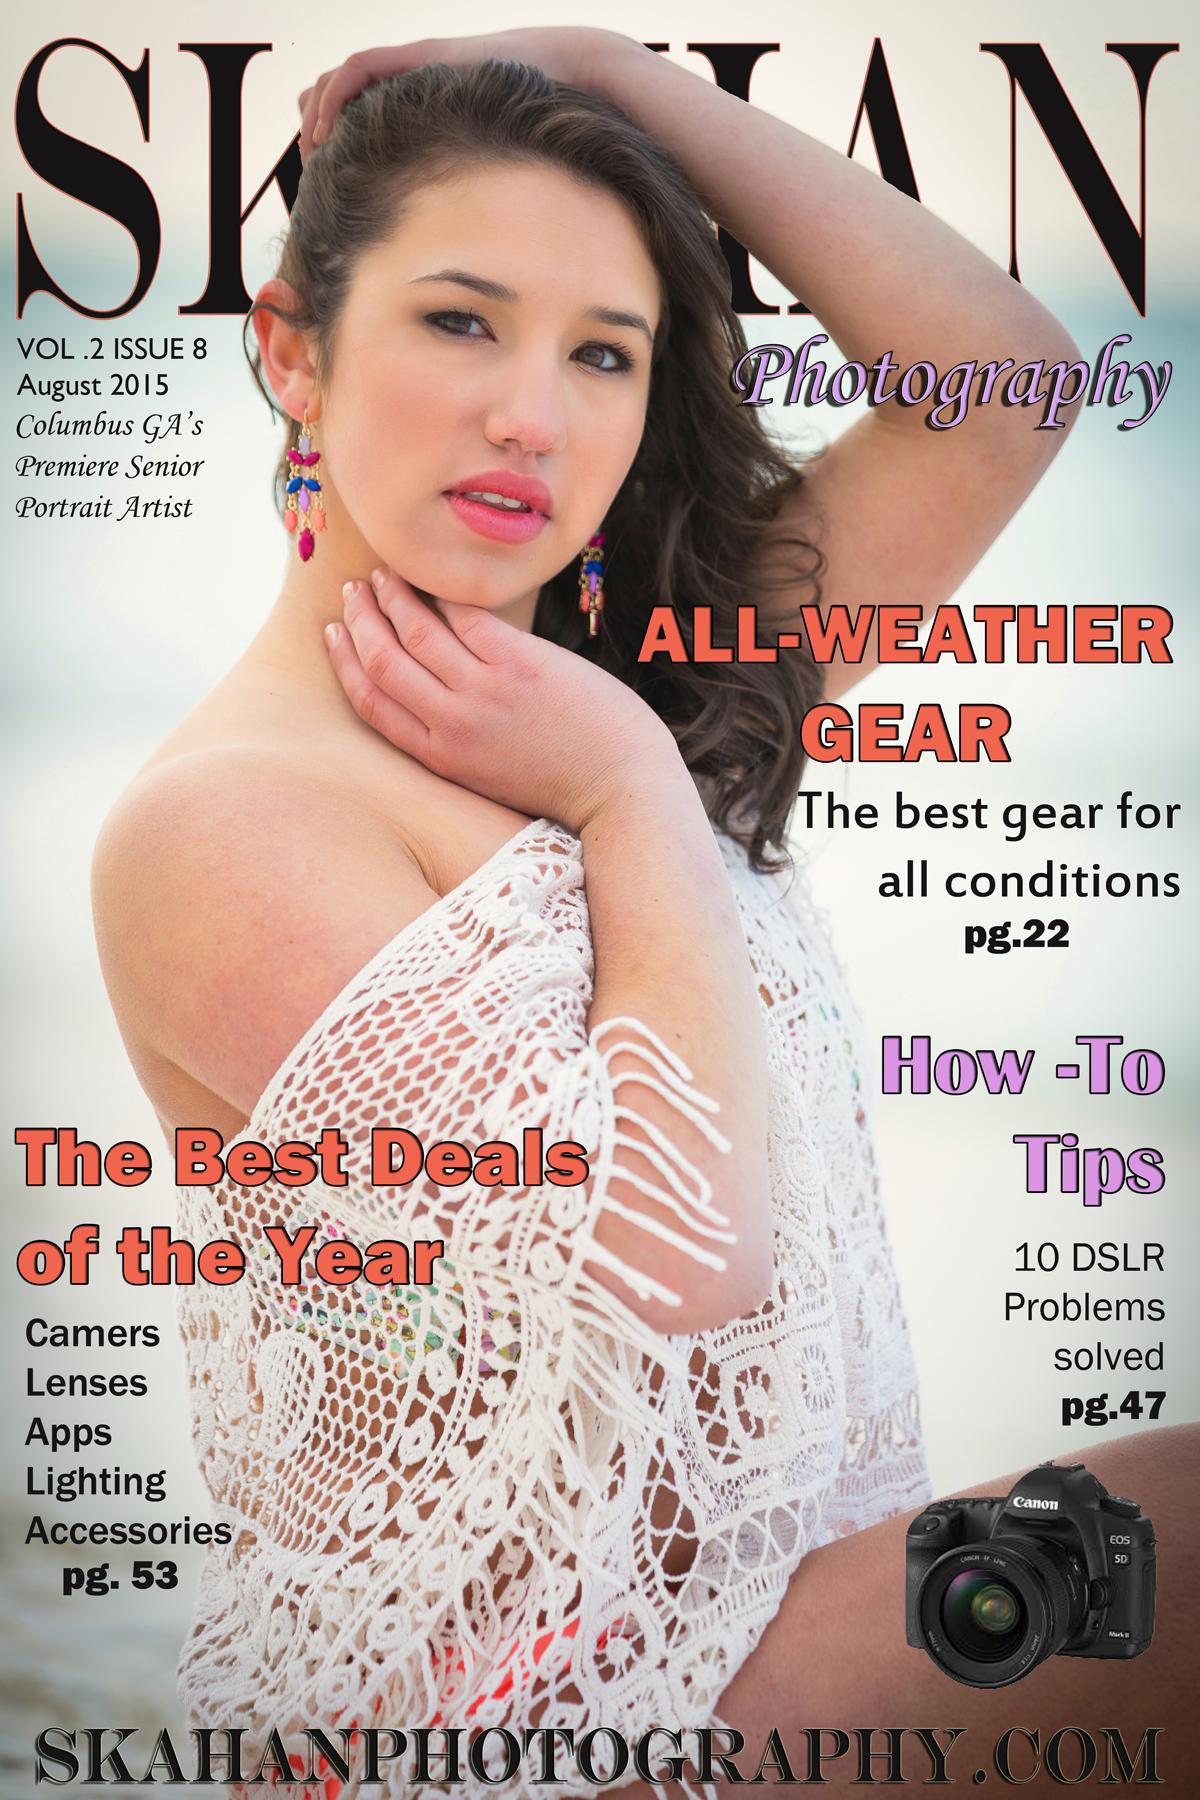 Volume 2 Issue 8 Aug 2015